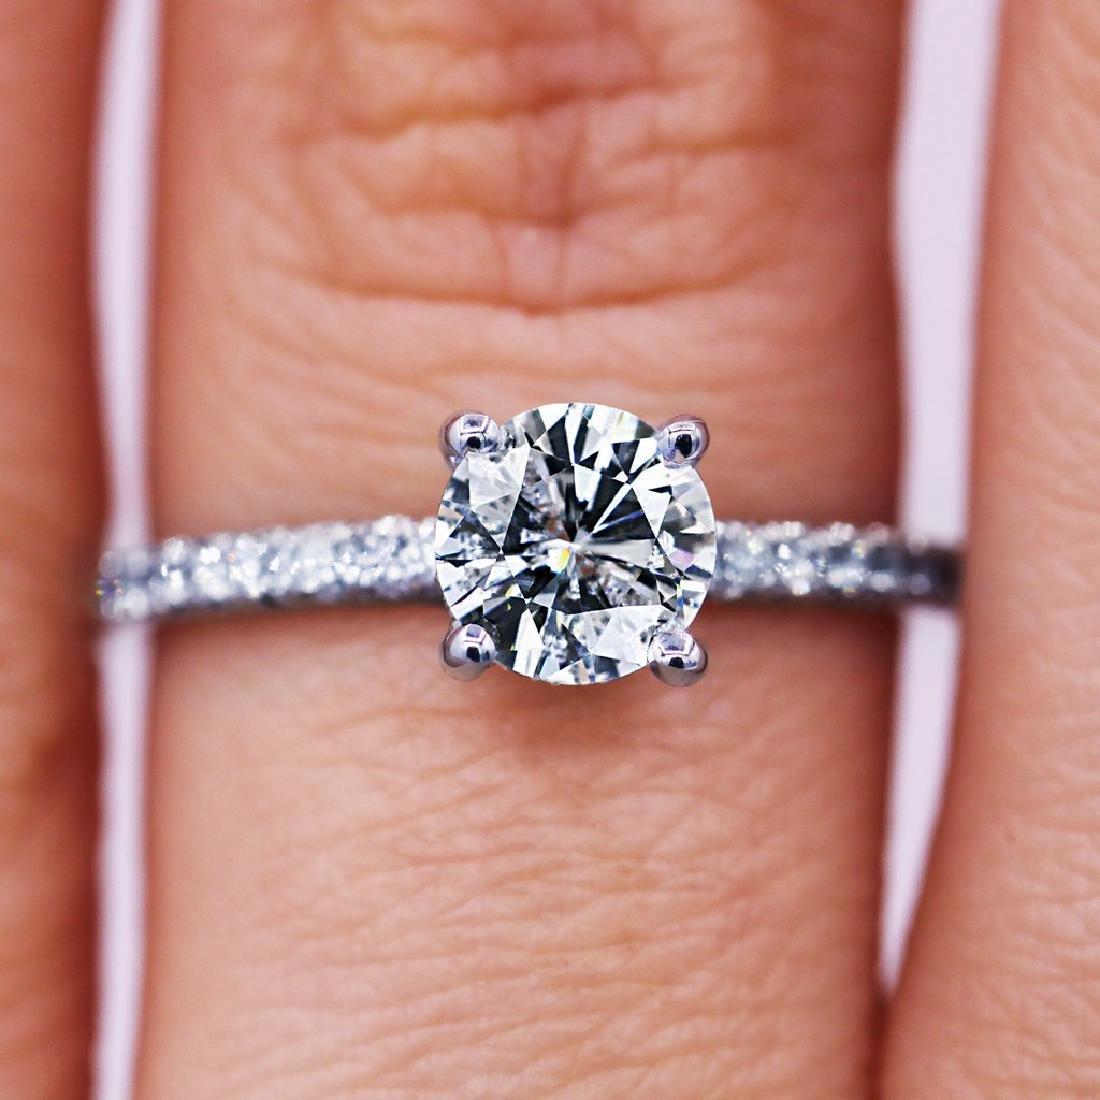 Sparkling 1.03 TCW round cut diamond pave engagement